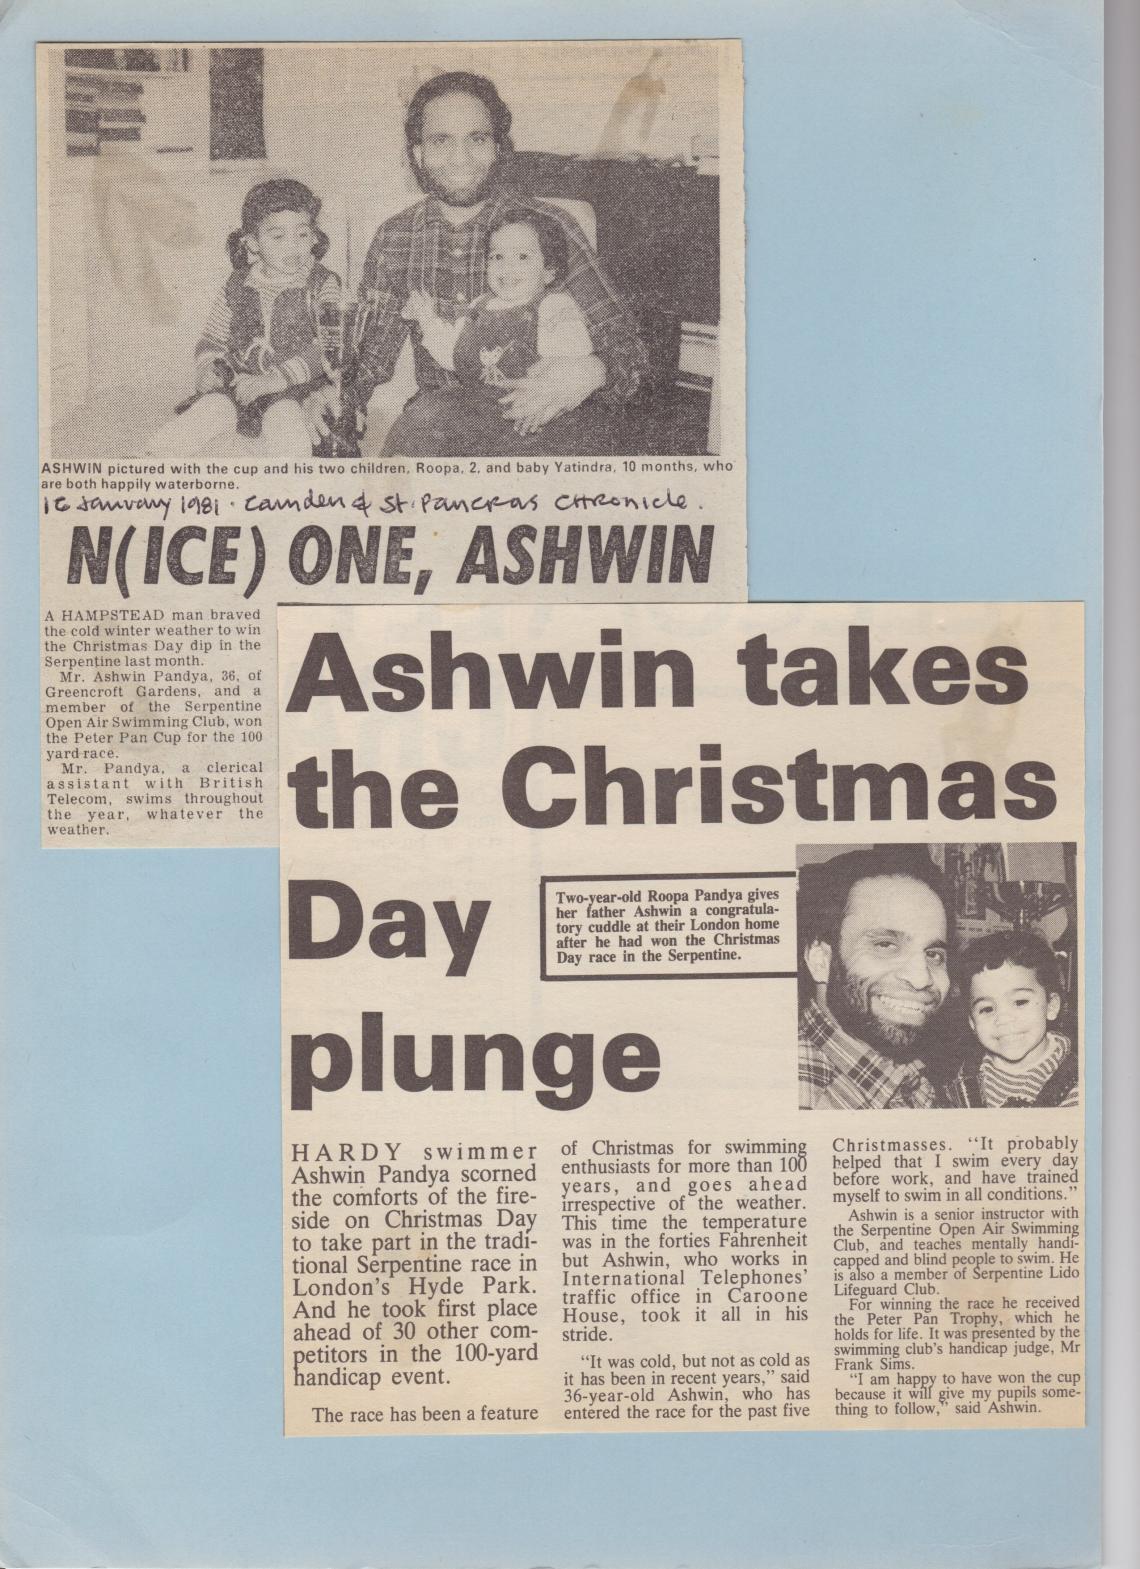 Proud Dad Ashwin won the Christmas Day race in 1980